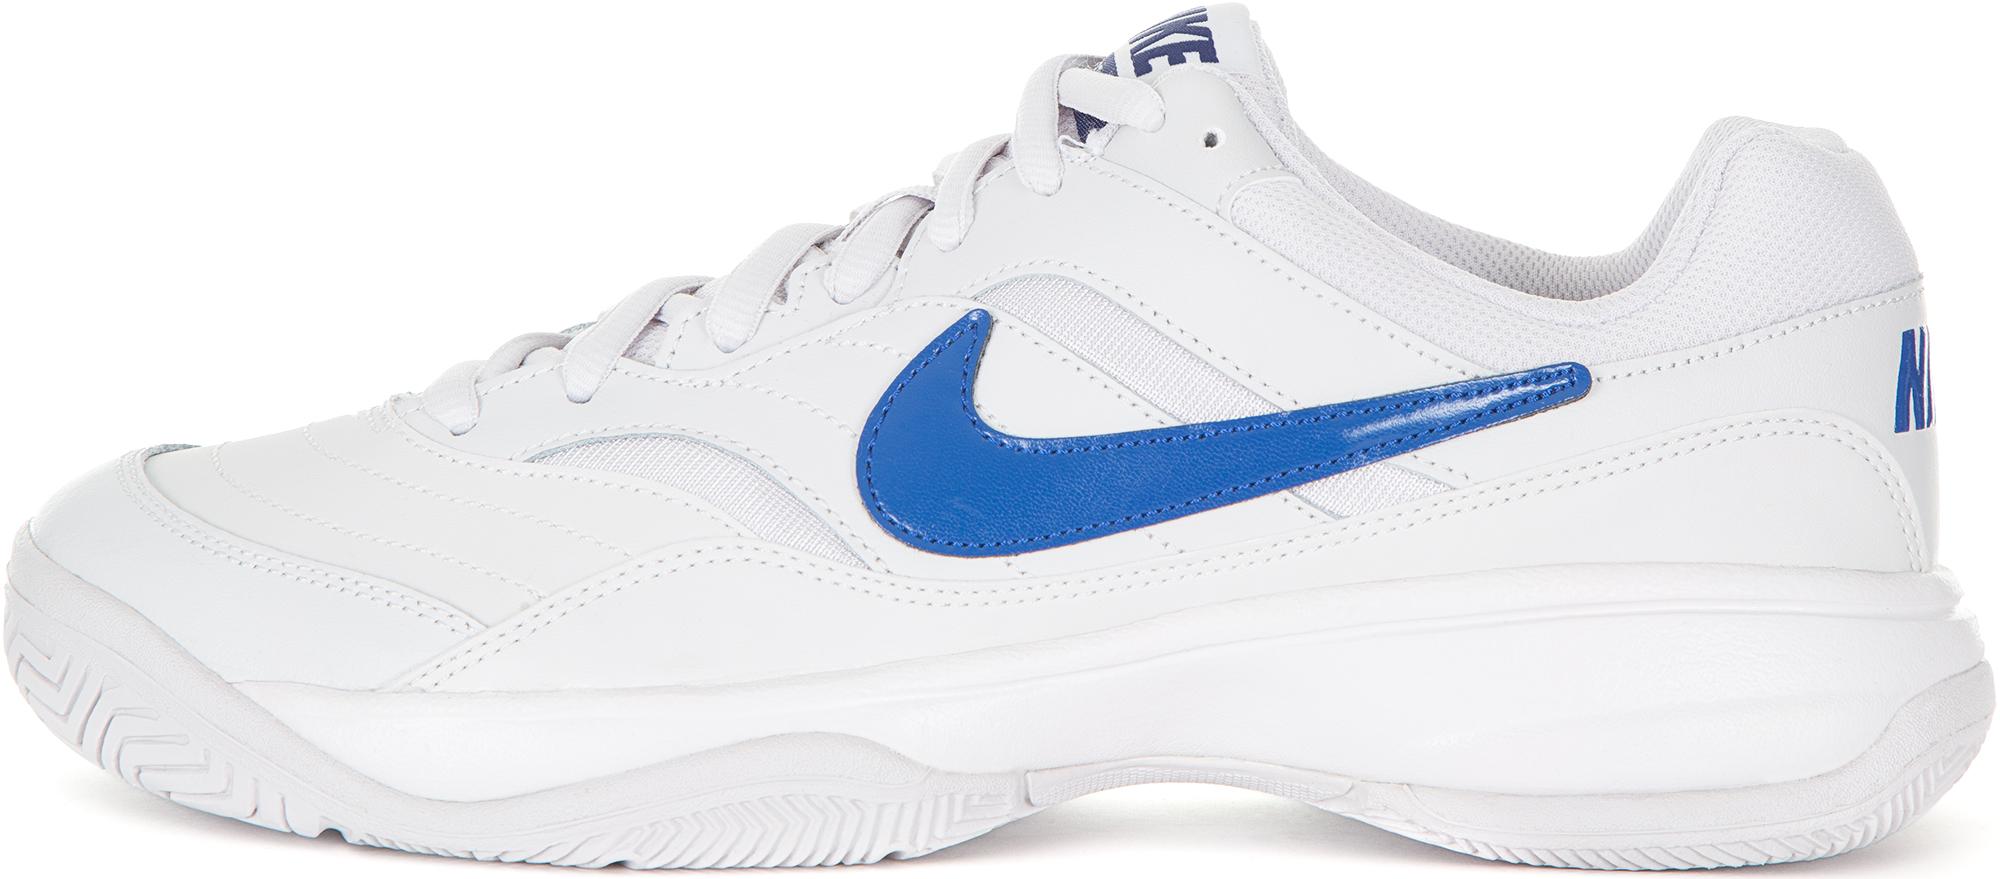 Фото - Nike Кроссовки мужские Nike Court Lite, размер 45 кроссовки мужские твое цвет белый a4390 размер 45